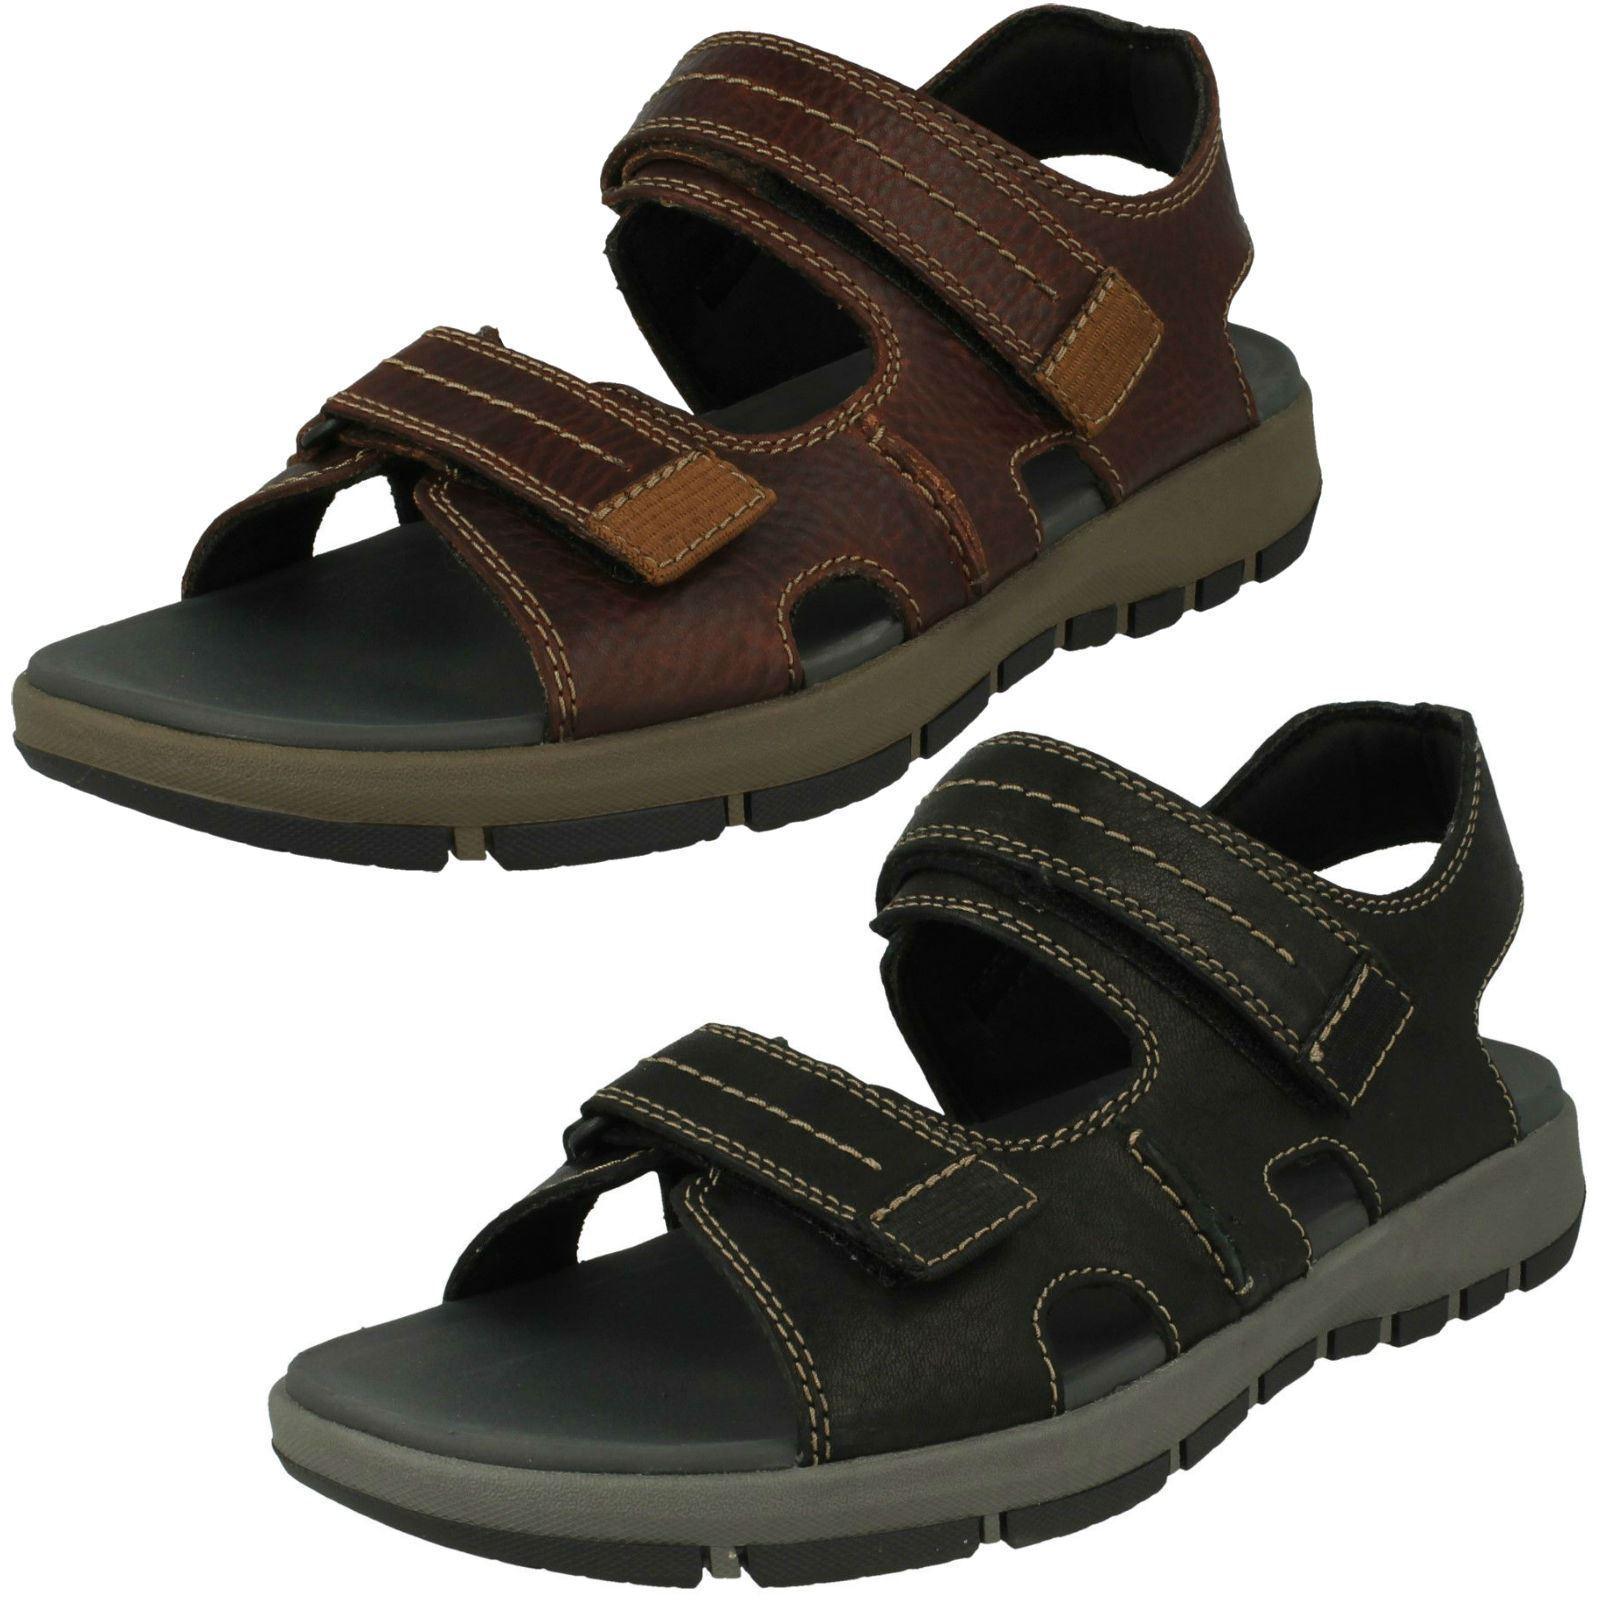 Mens Clarks Hook & Loop Fastening Sandals - Brixby Shore